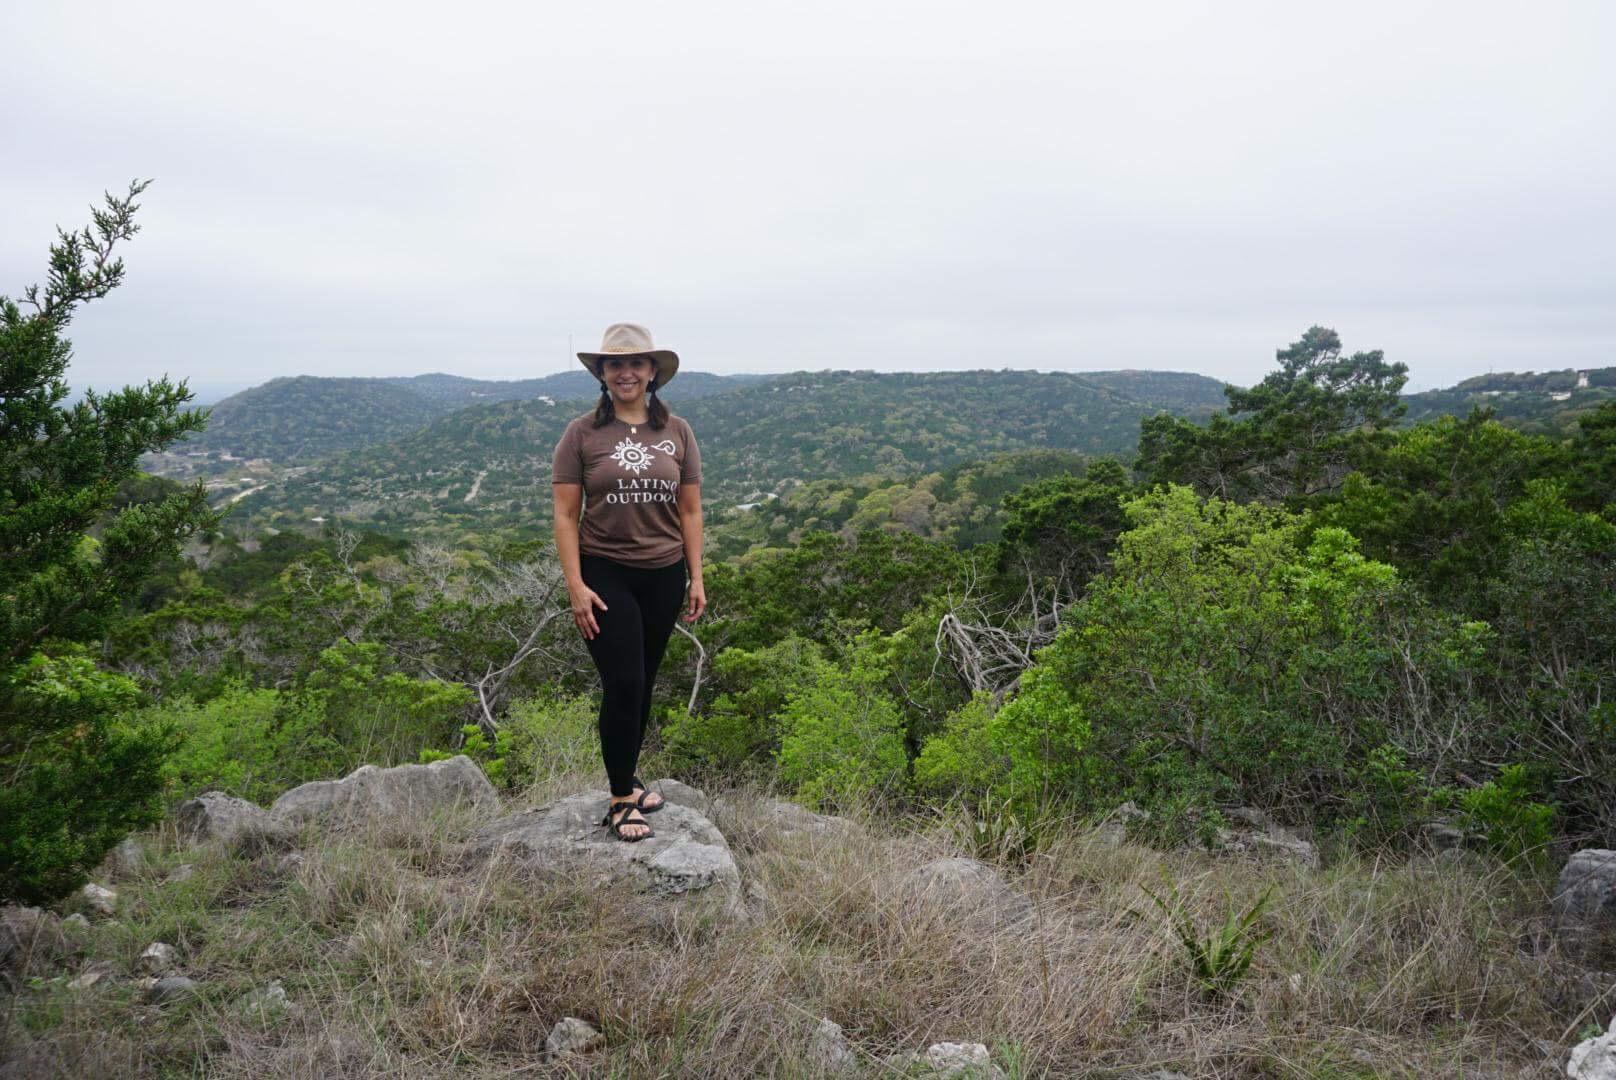 Josie Gutierrez - Program Coordinator - San Antonio, Latino OutdoorsInstagram: @fitfunandTwitter: @fitfunand